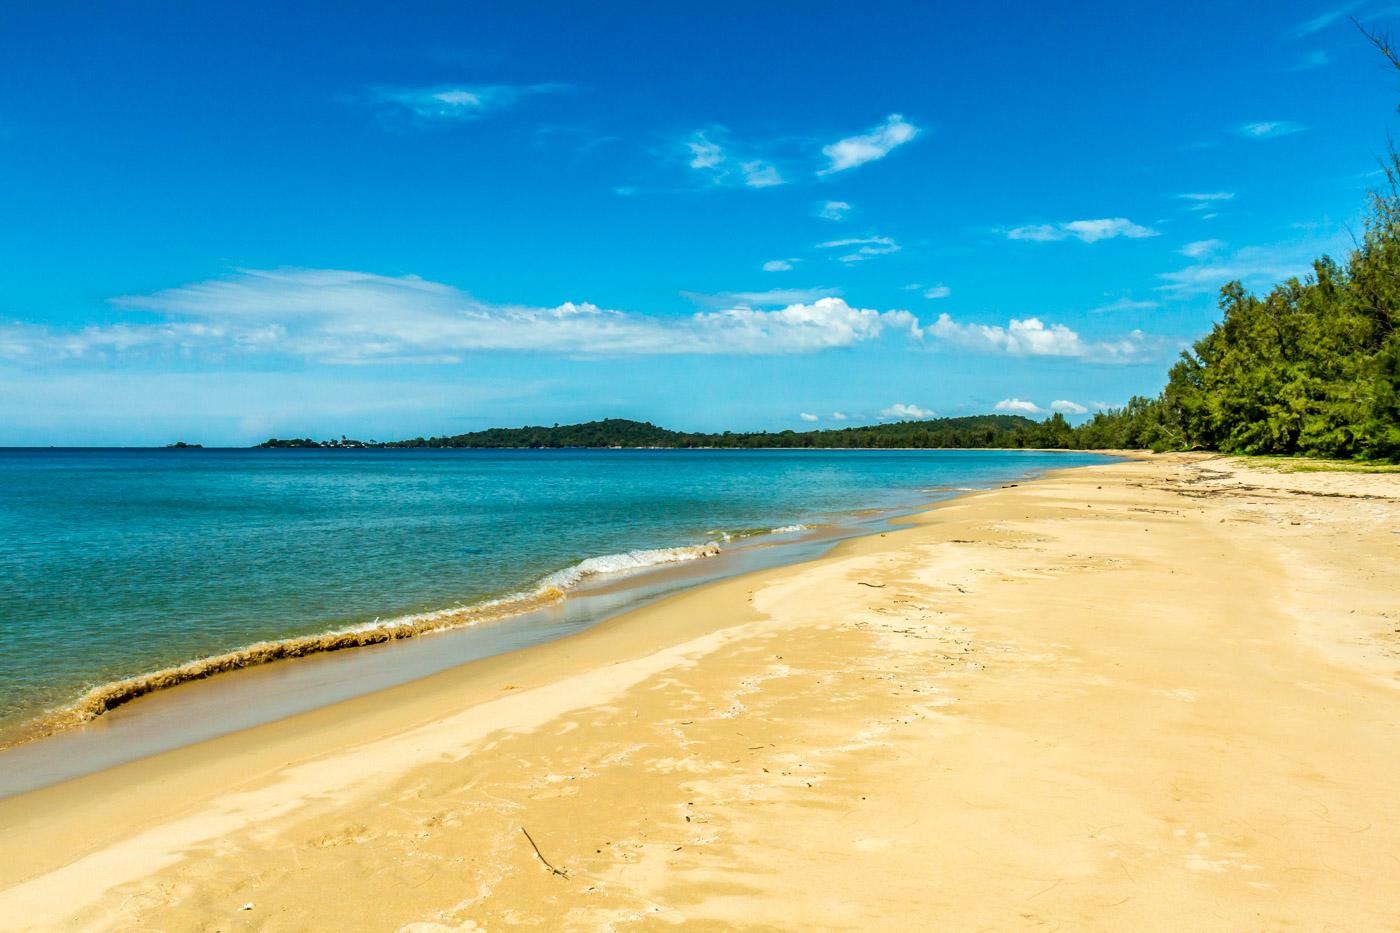 Dai Beach was a good place for a swim.